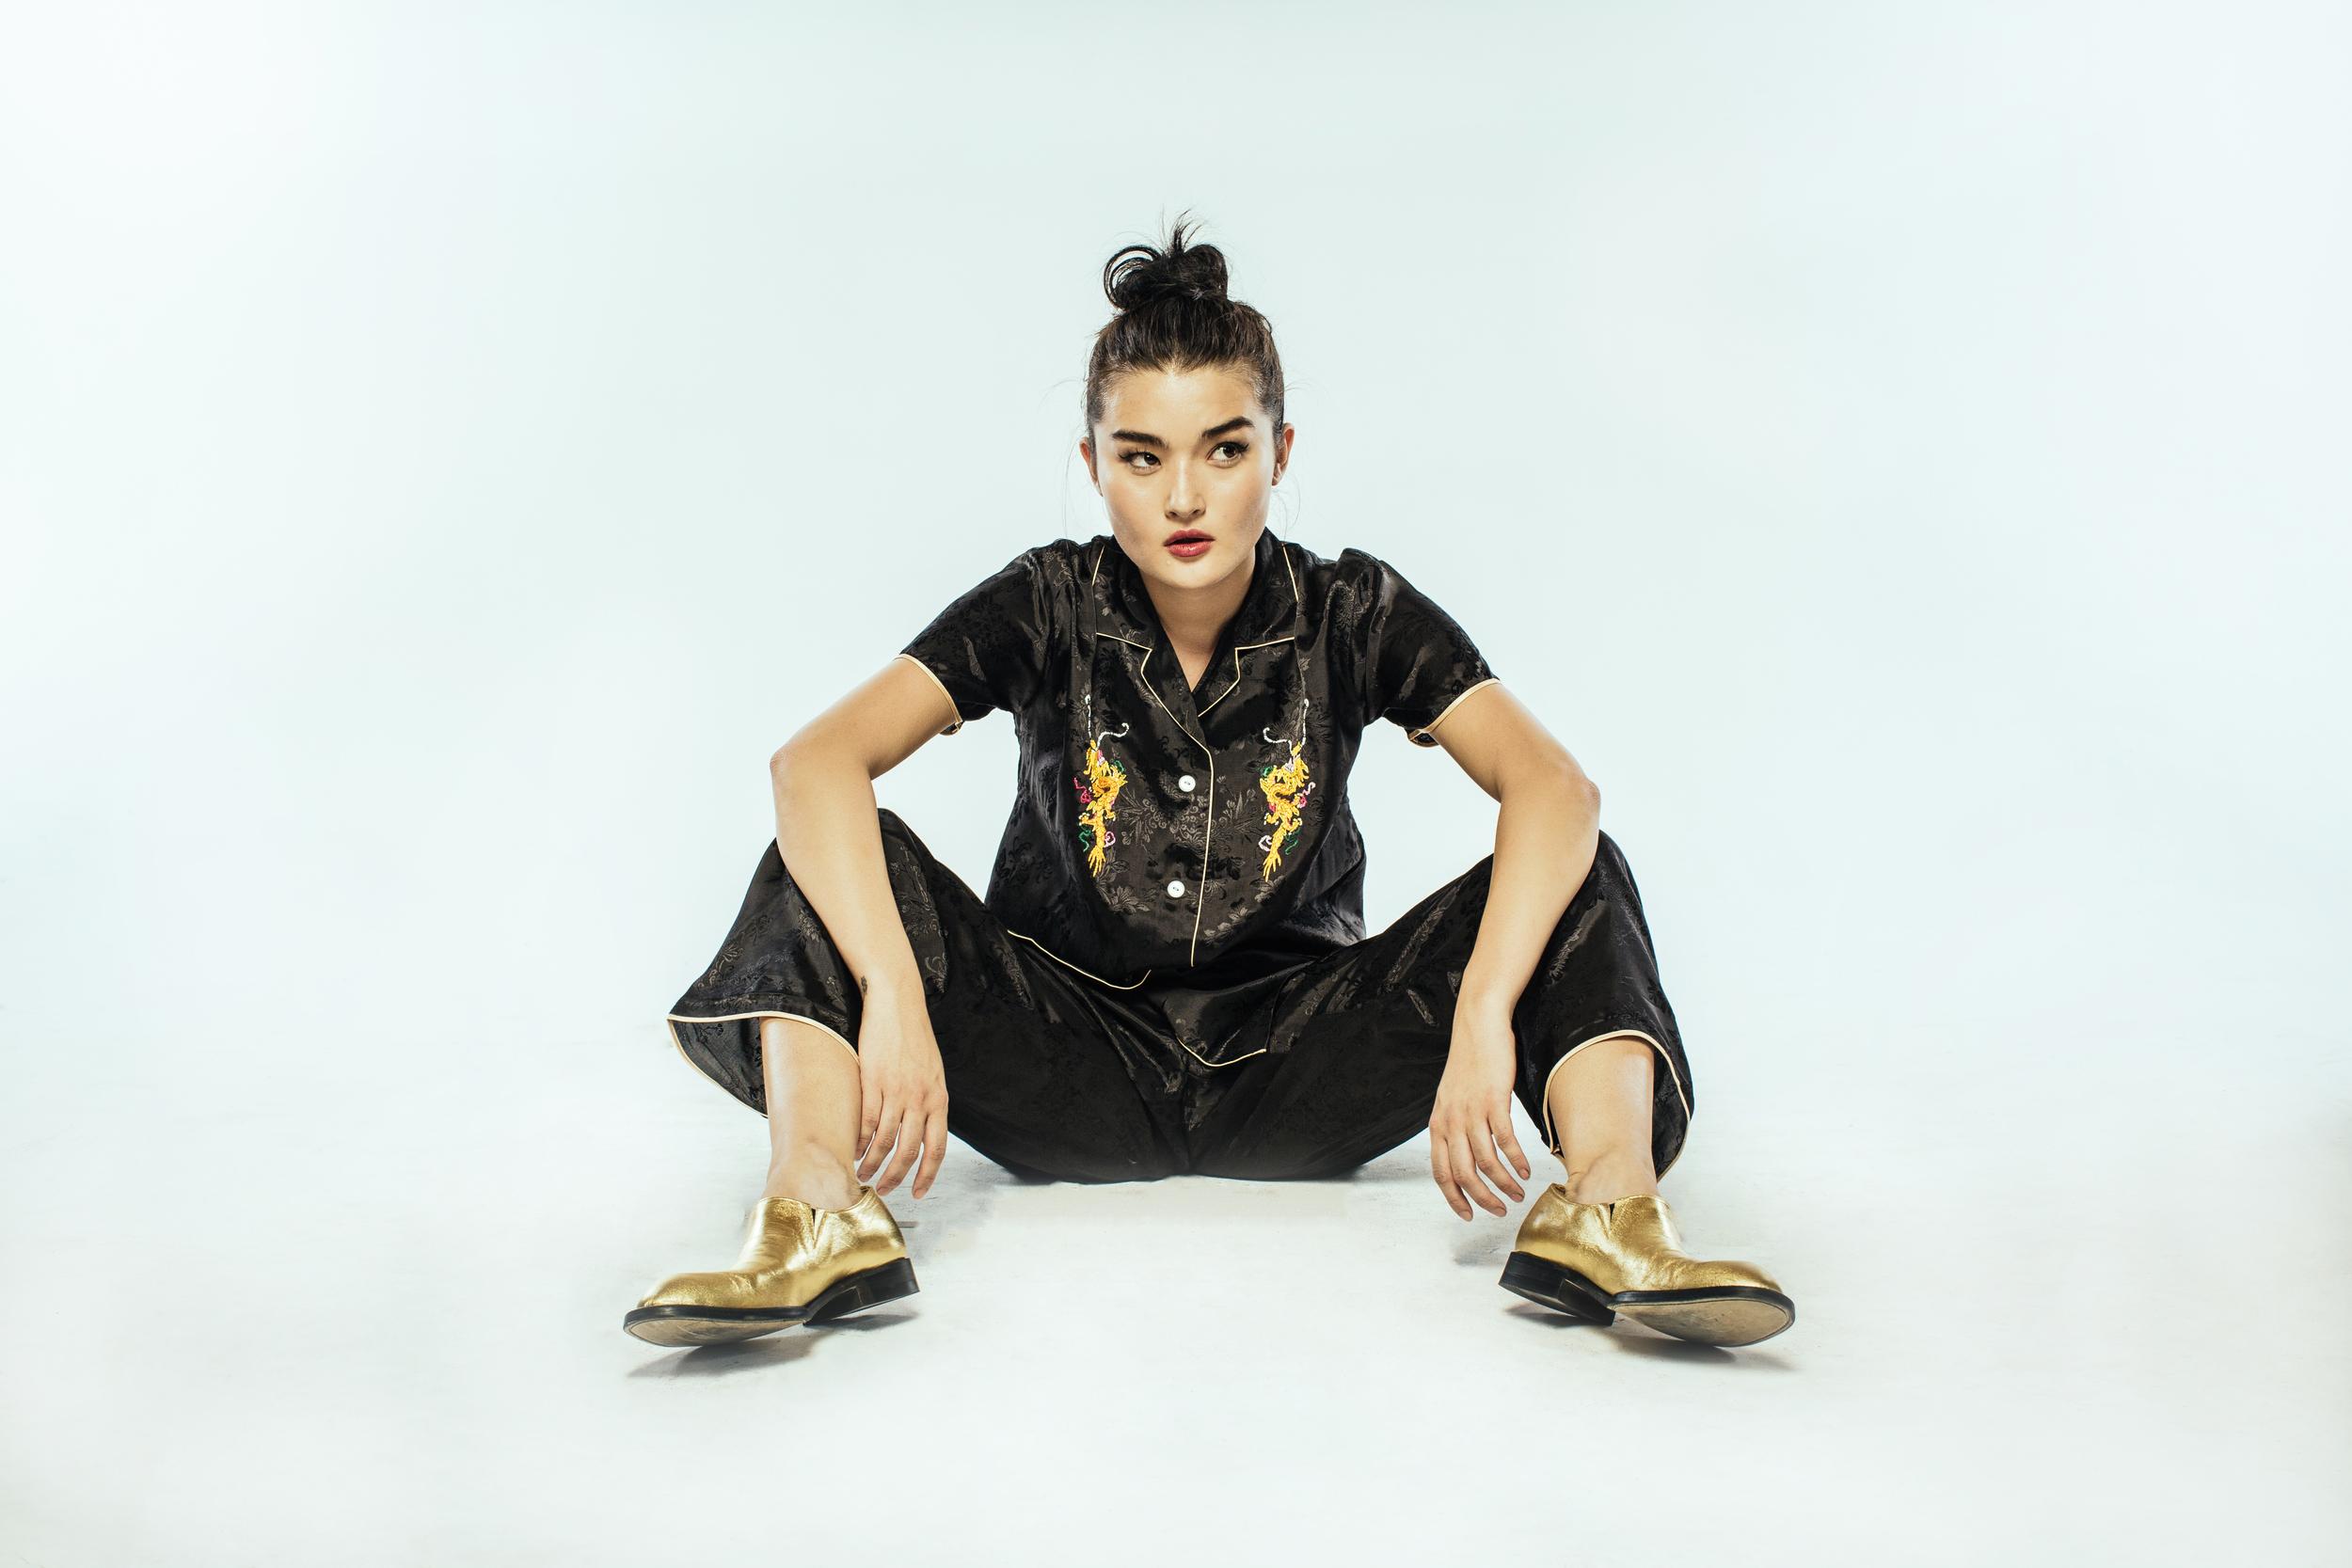 Top & Pants: Zara